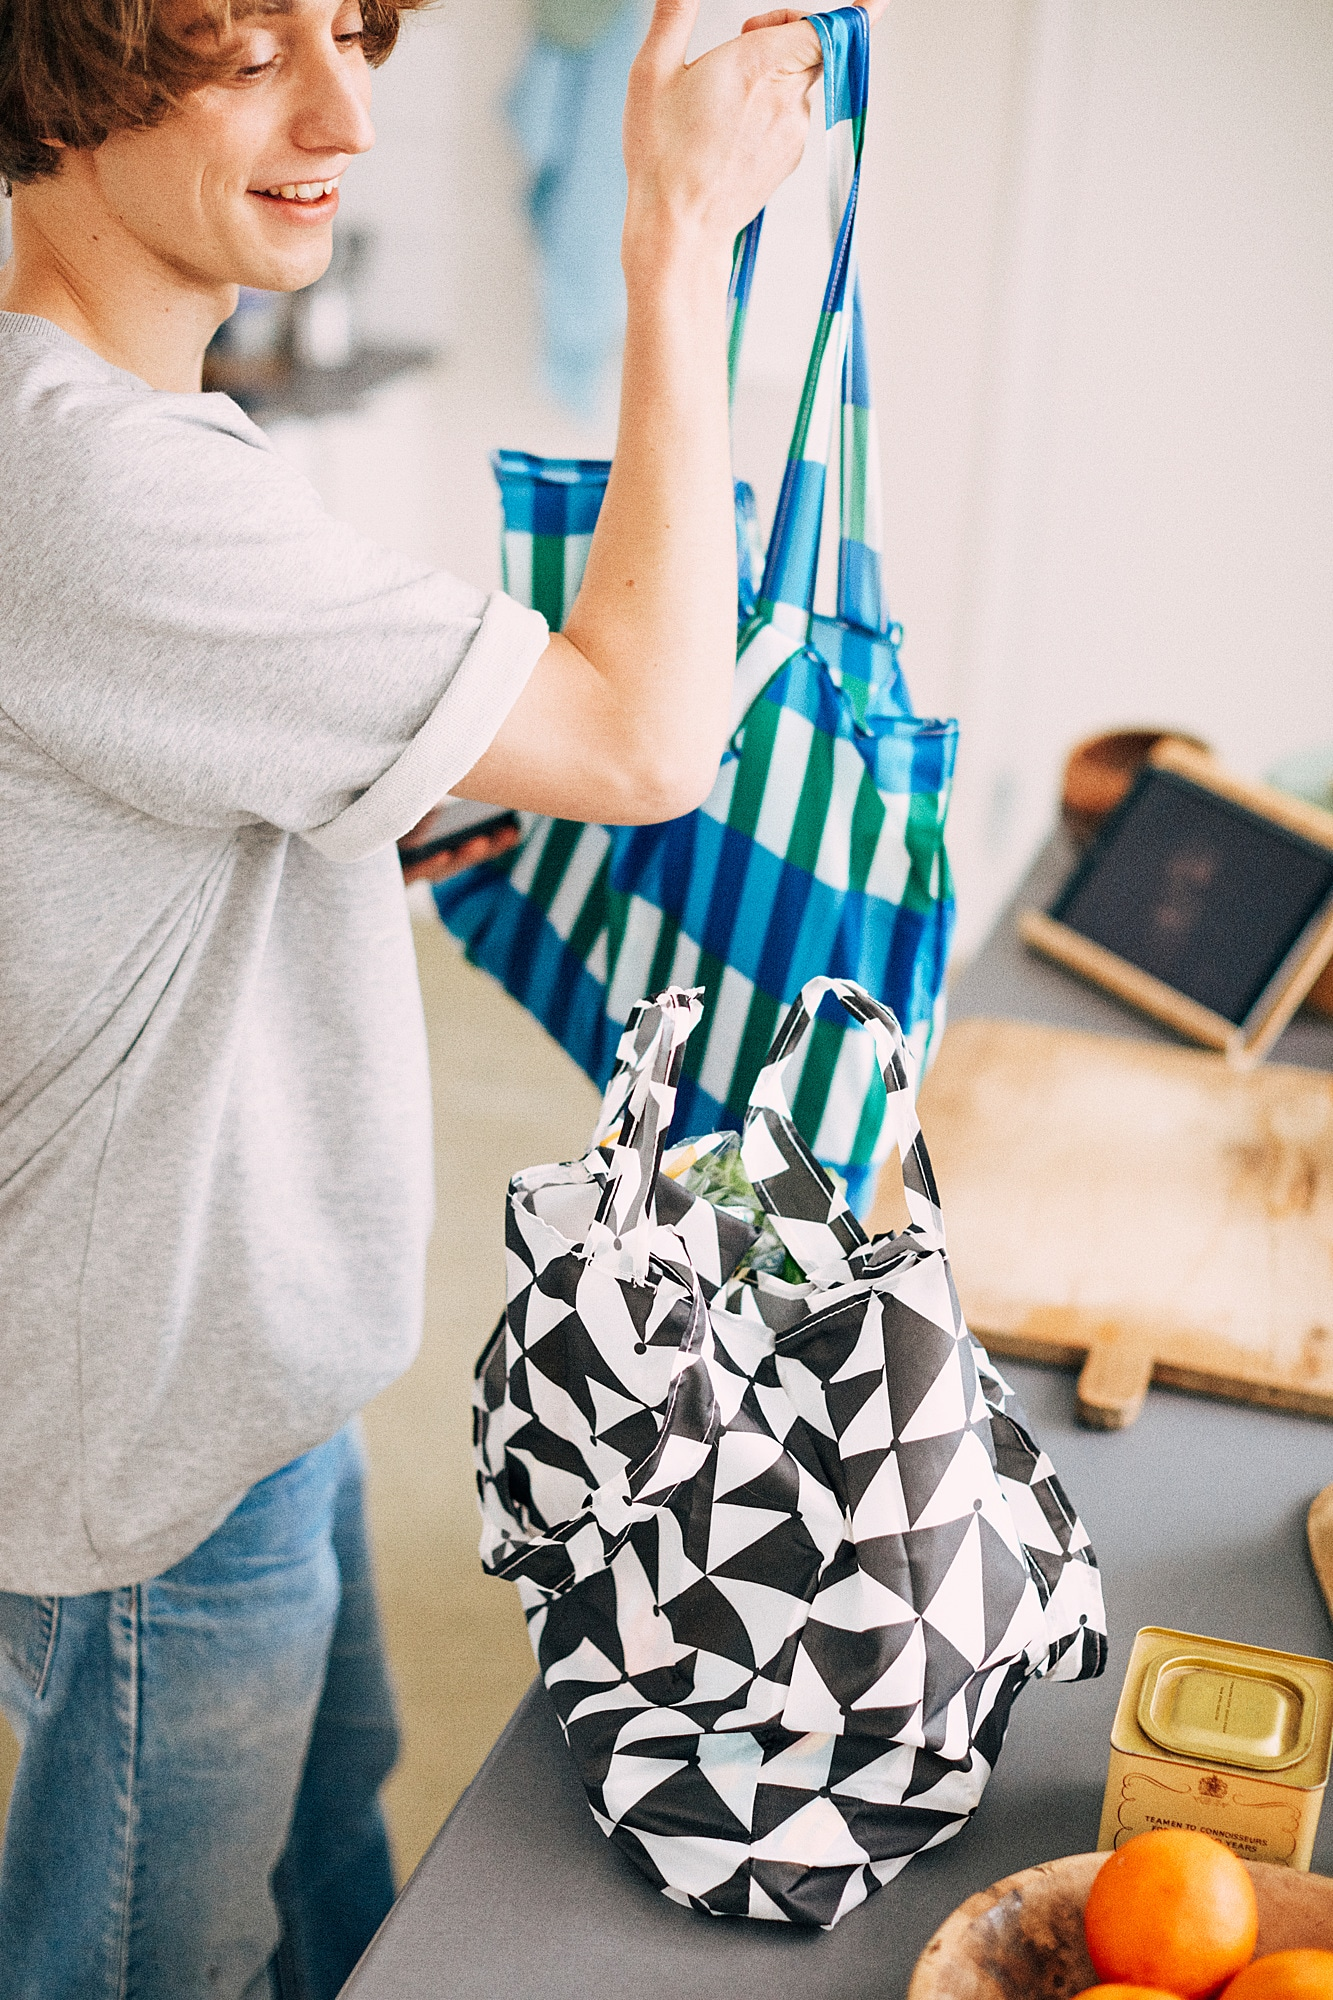 SKYNKE Nákupní taška, černá/bílá